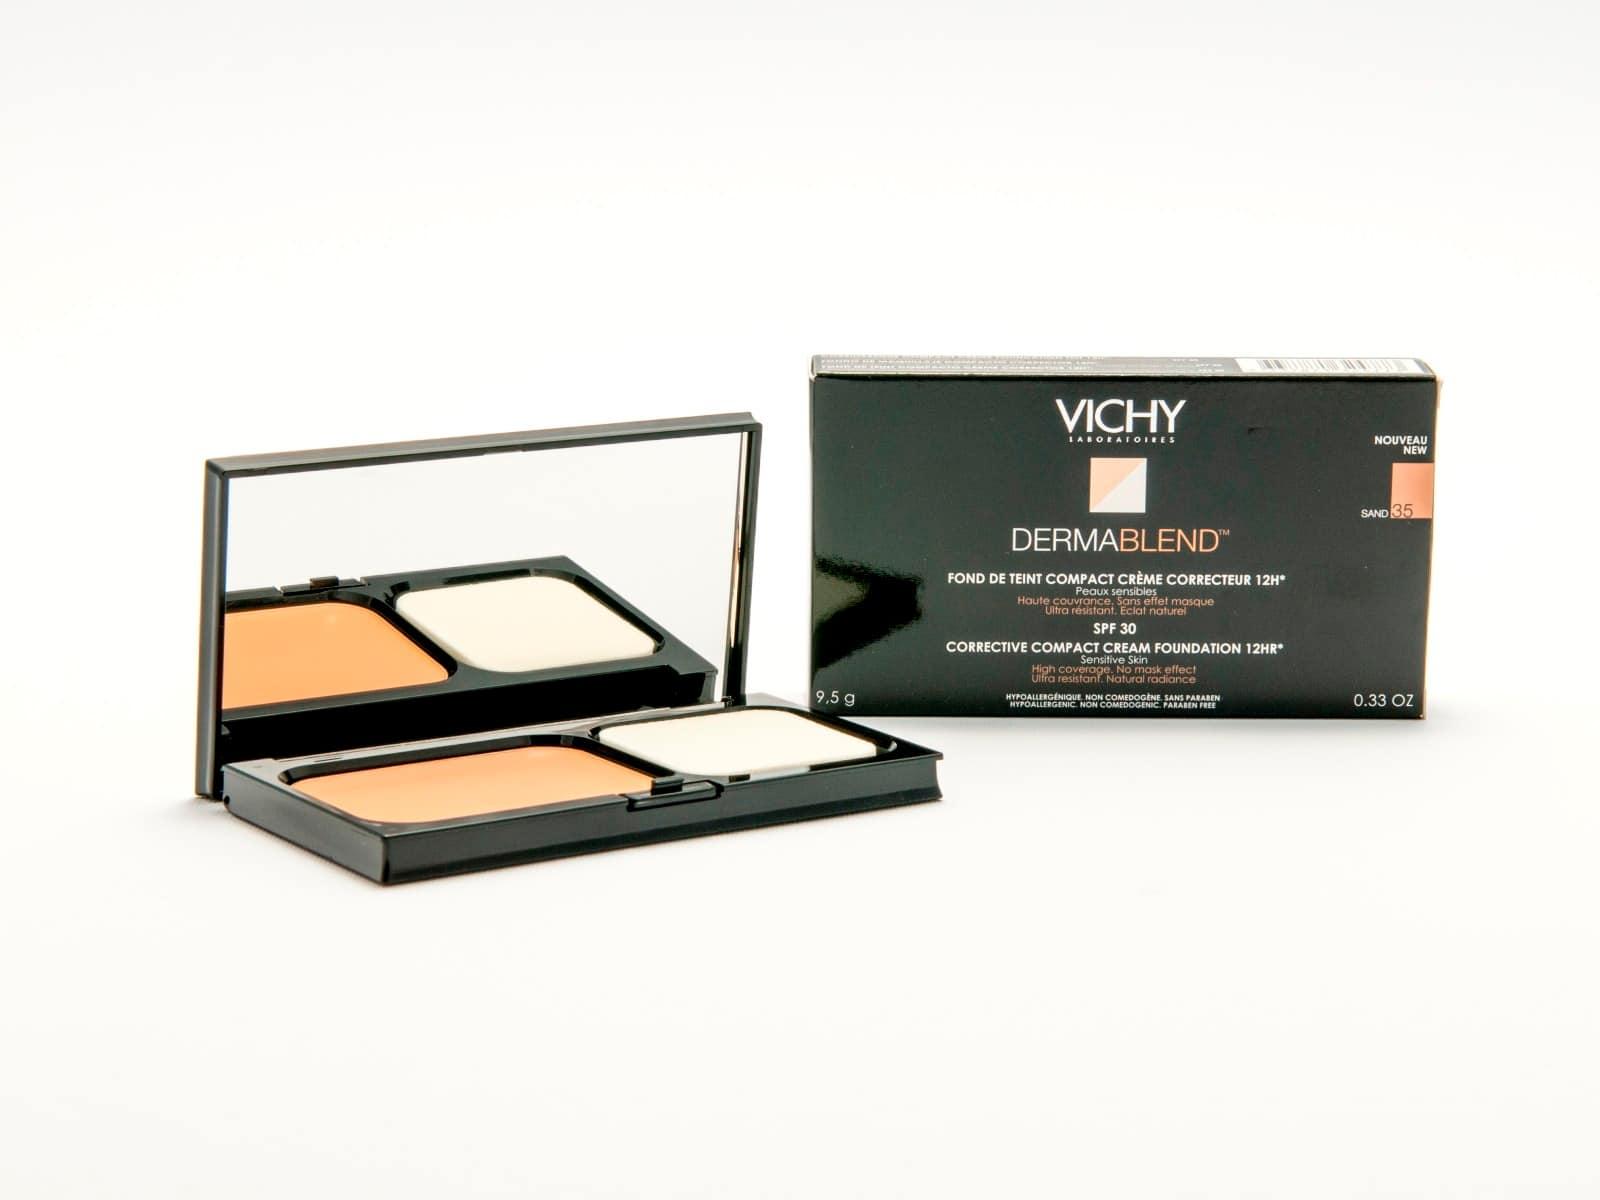 Vichy Dermablend Fondotinta Compatto In Crema